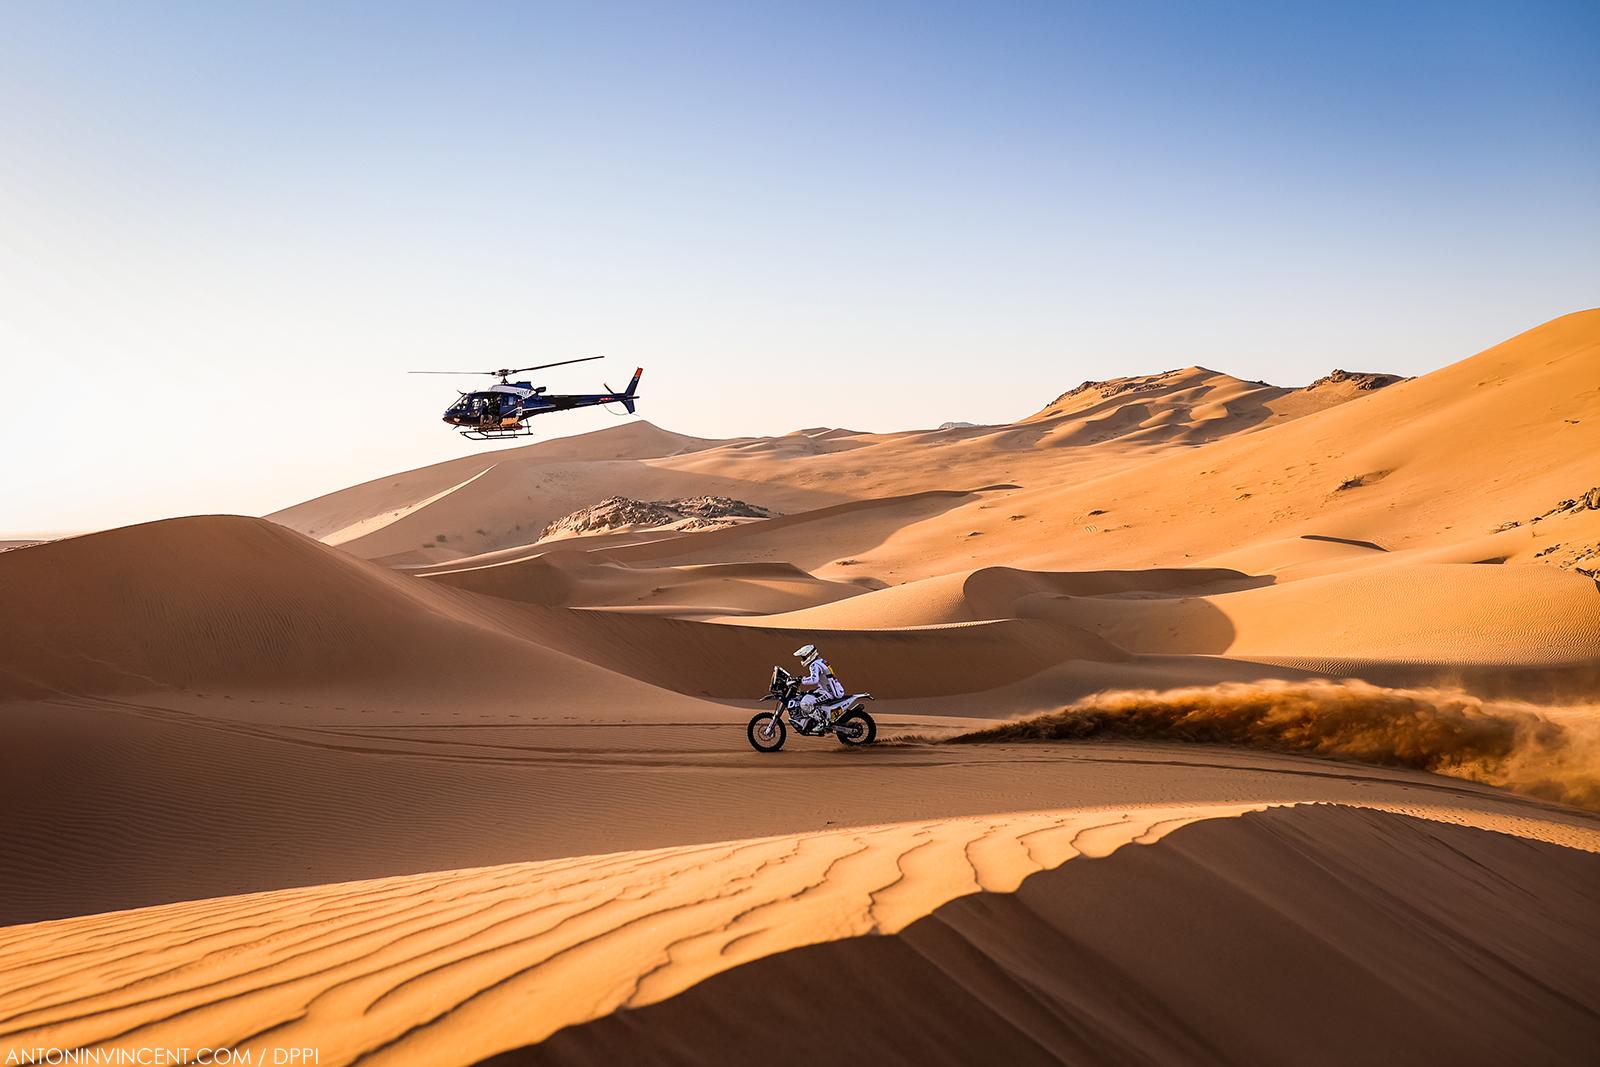 12 De Soultrait Xavier (fra), Husqvarna, HT Rally Raid Husqvarna Racing, Motul, Moto, Bike, action during the 2nd stage of the Dakar 2021 between Bisha and Wadi Al Dawasir, in Saudi Arabia on January 4, 2021 - Photo Antonin Vincent / DPPI